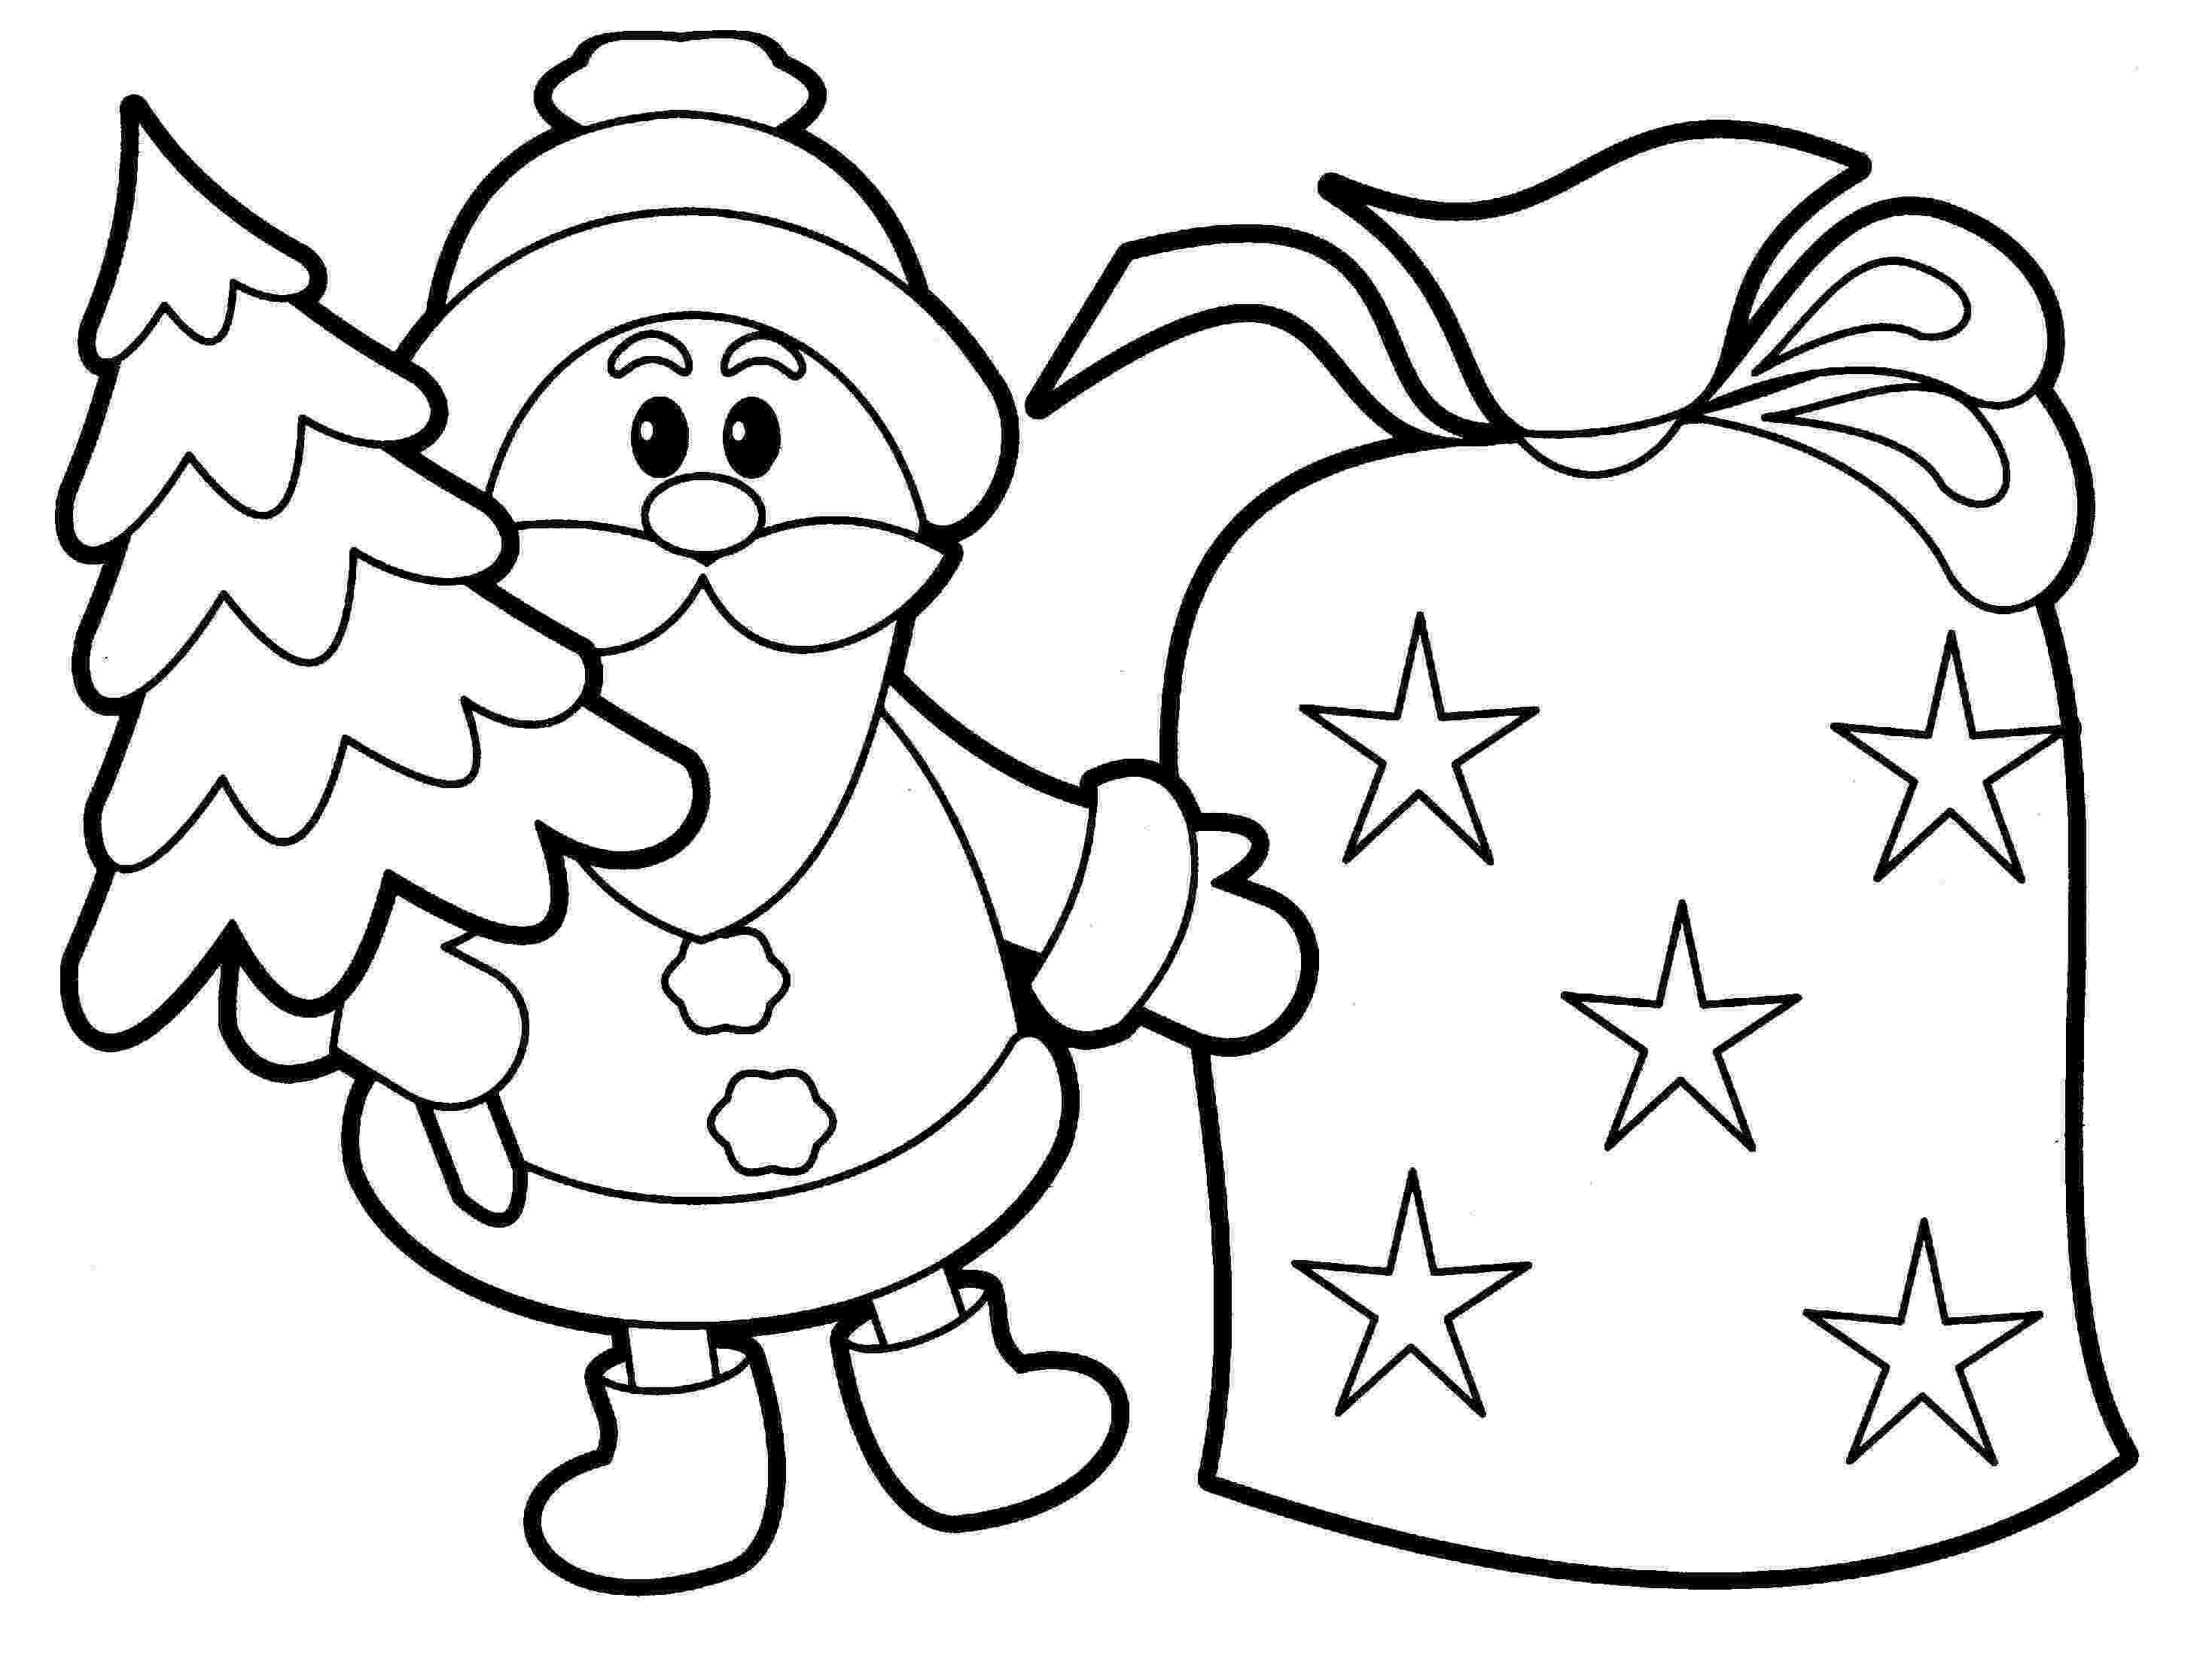 xmas printable coloring pages 10 free printable christmas coloring pages about a mom pages printable coloring xmas